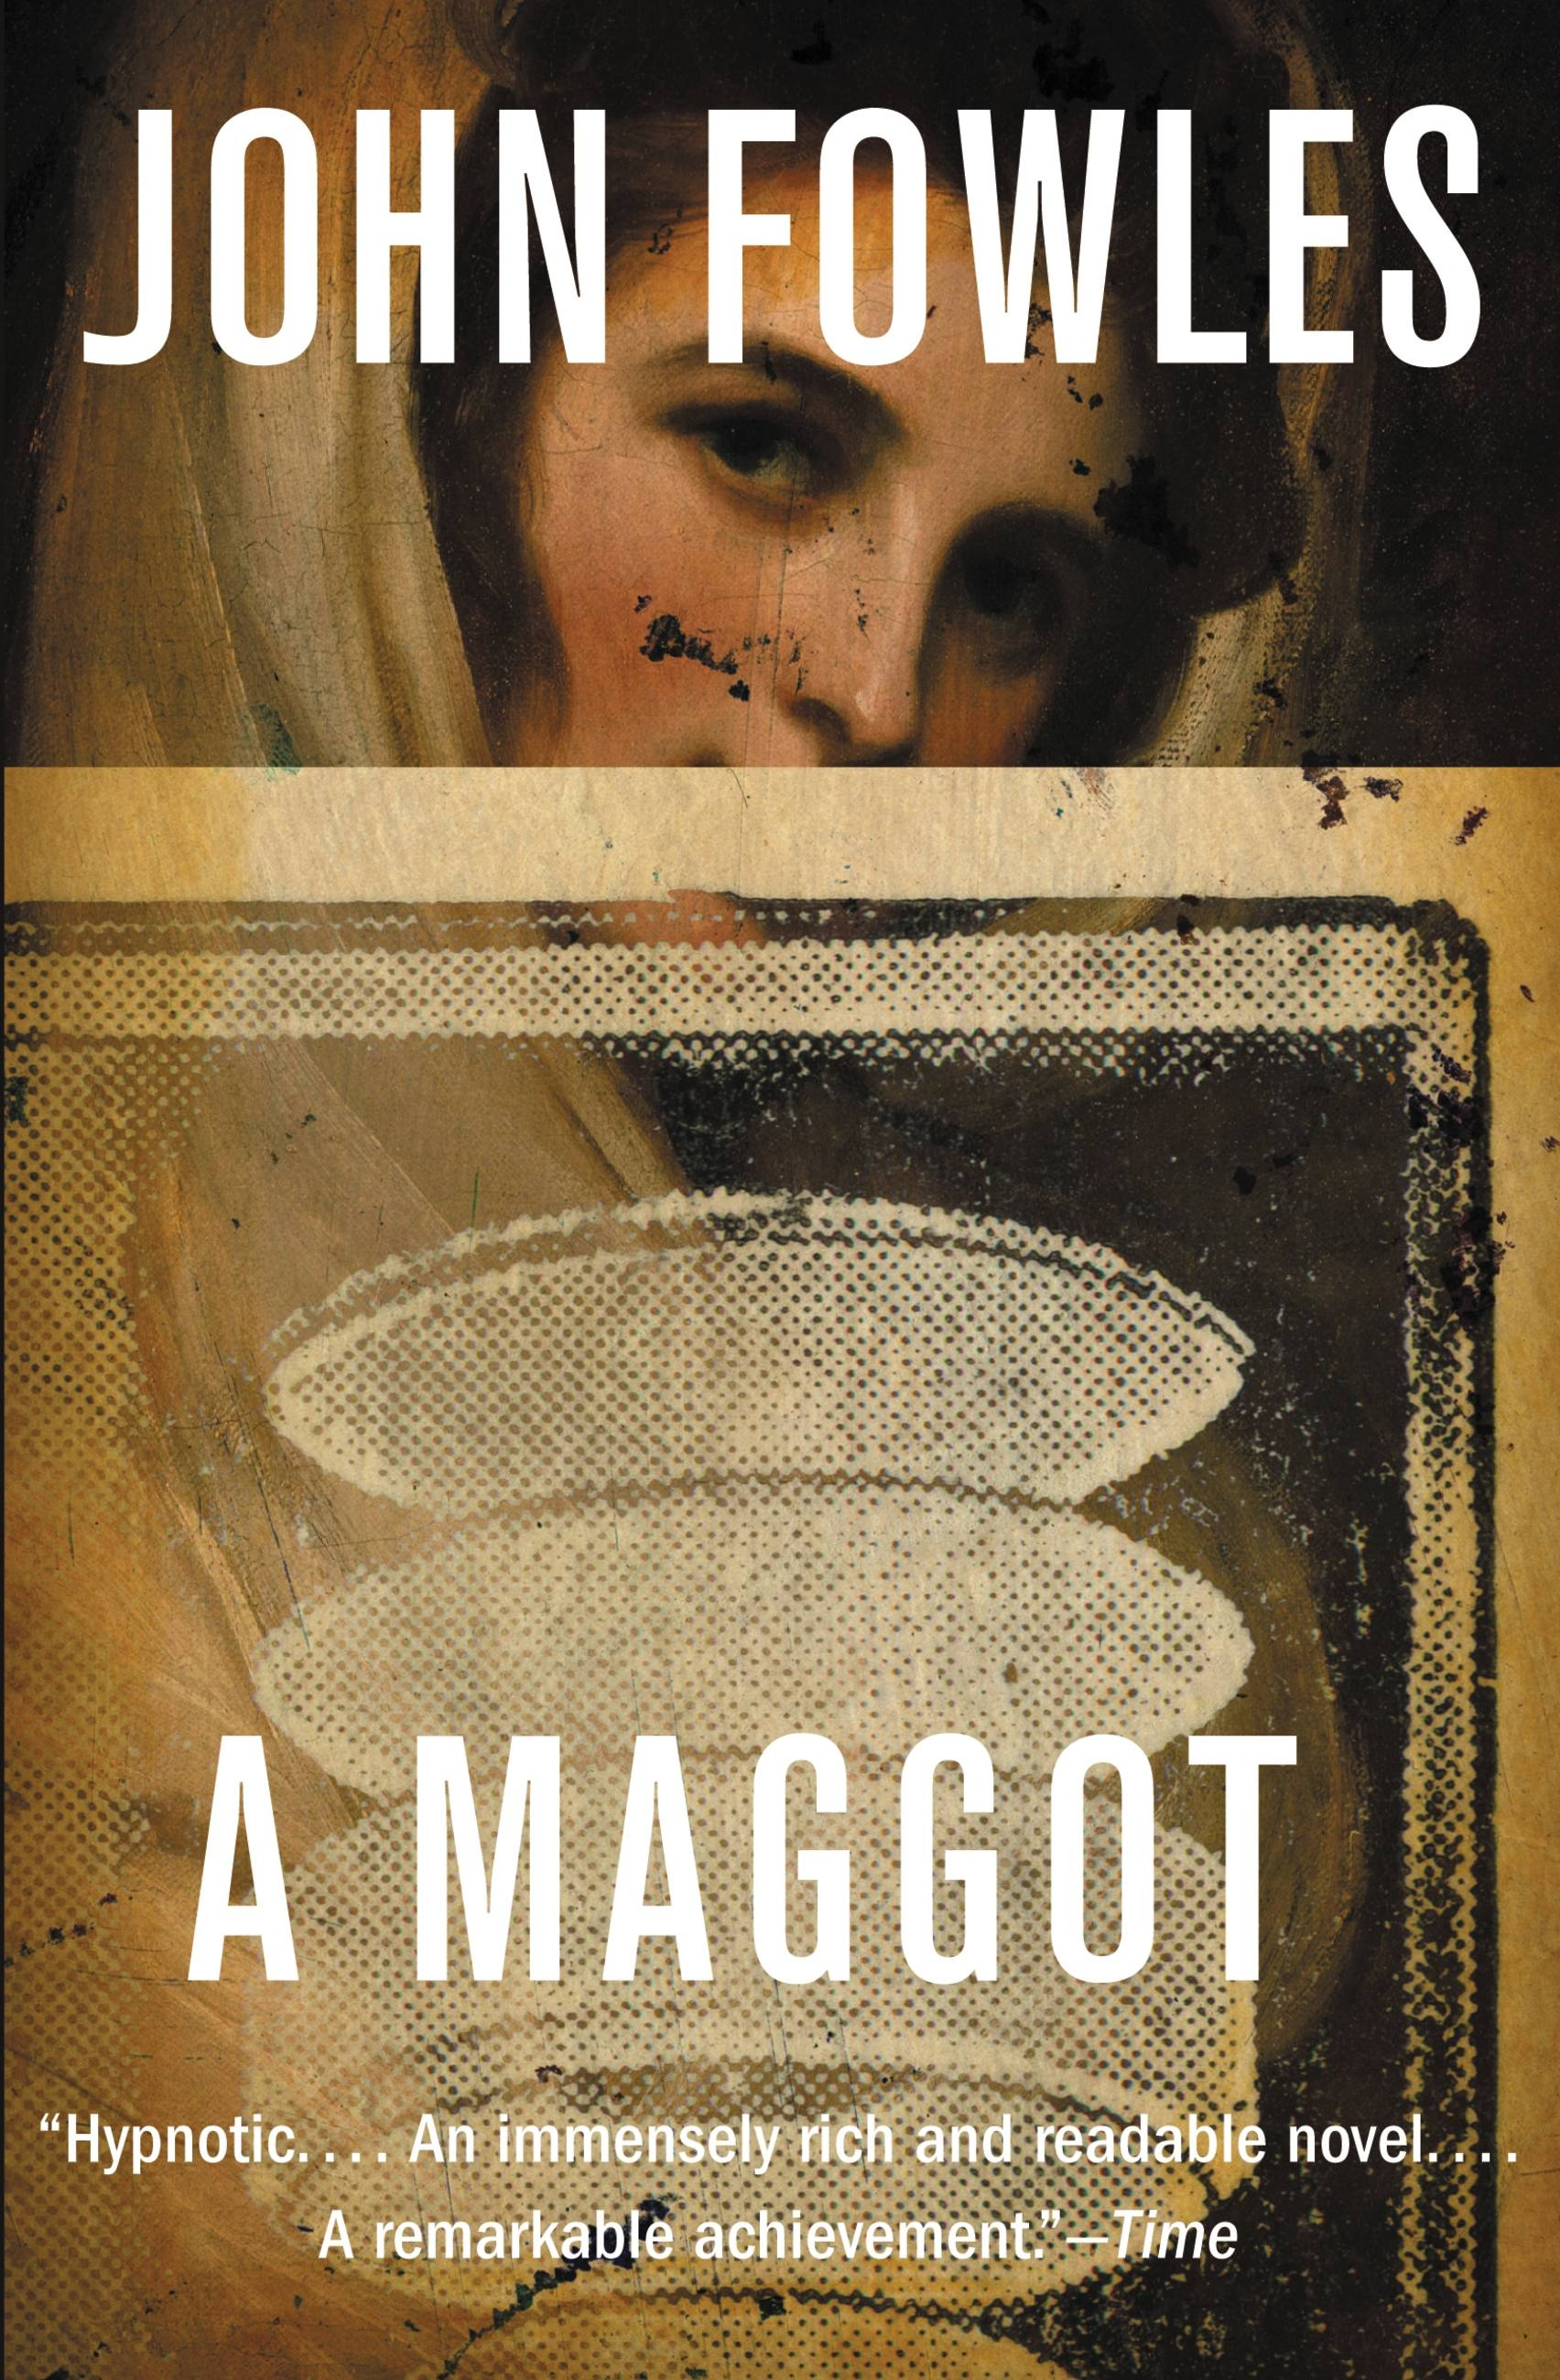 A Maggot by John Fowles | Hachette Book Group